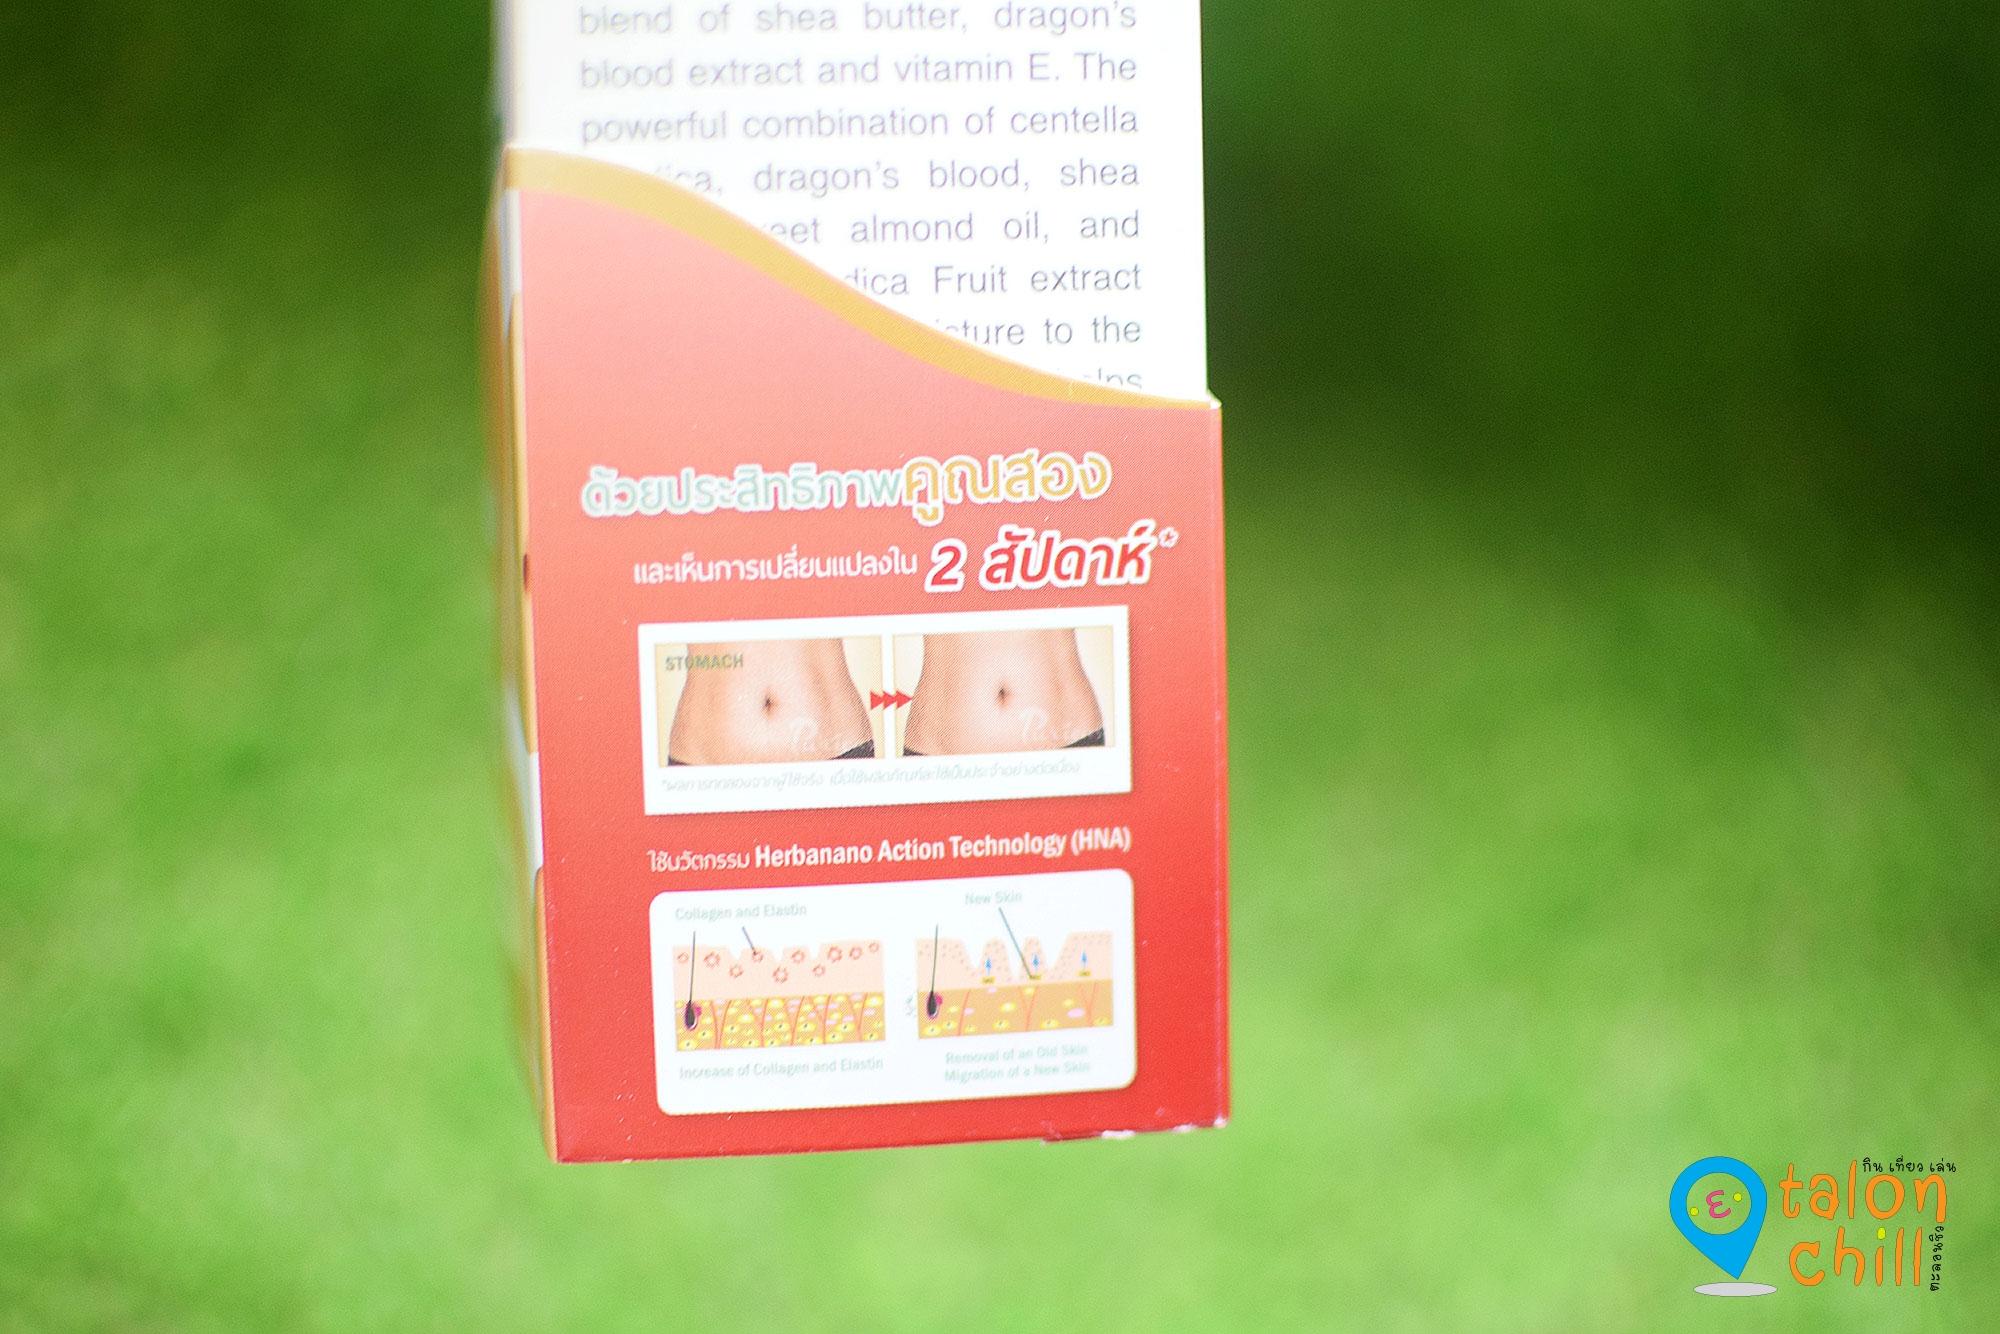 [Review] Puricas Stretch Marks Cream ครีมลดริ้วรอยแตกลาย